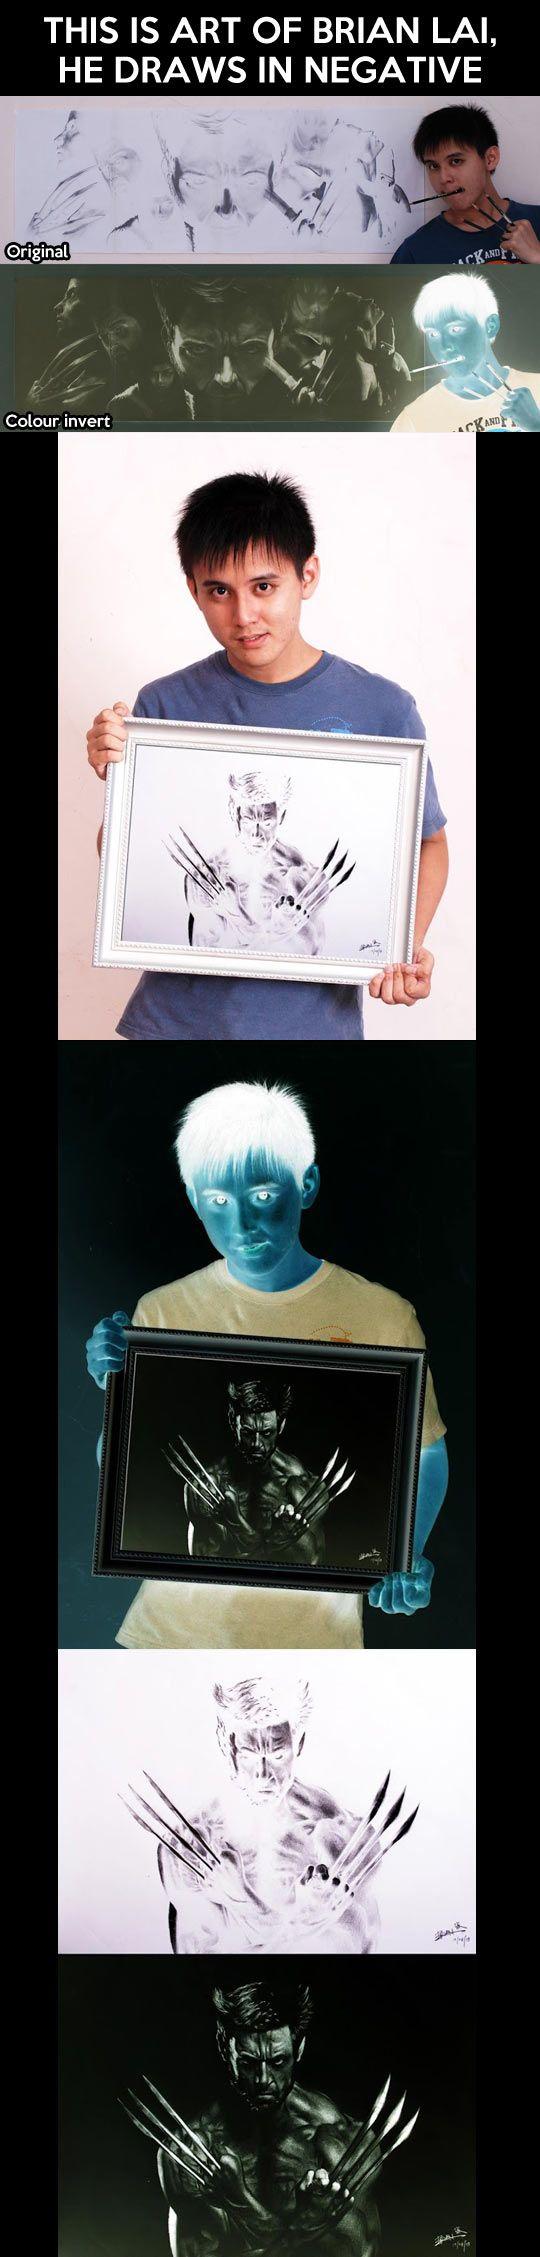 A positive appreciation for negative art... - The Meta Picture